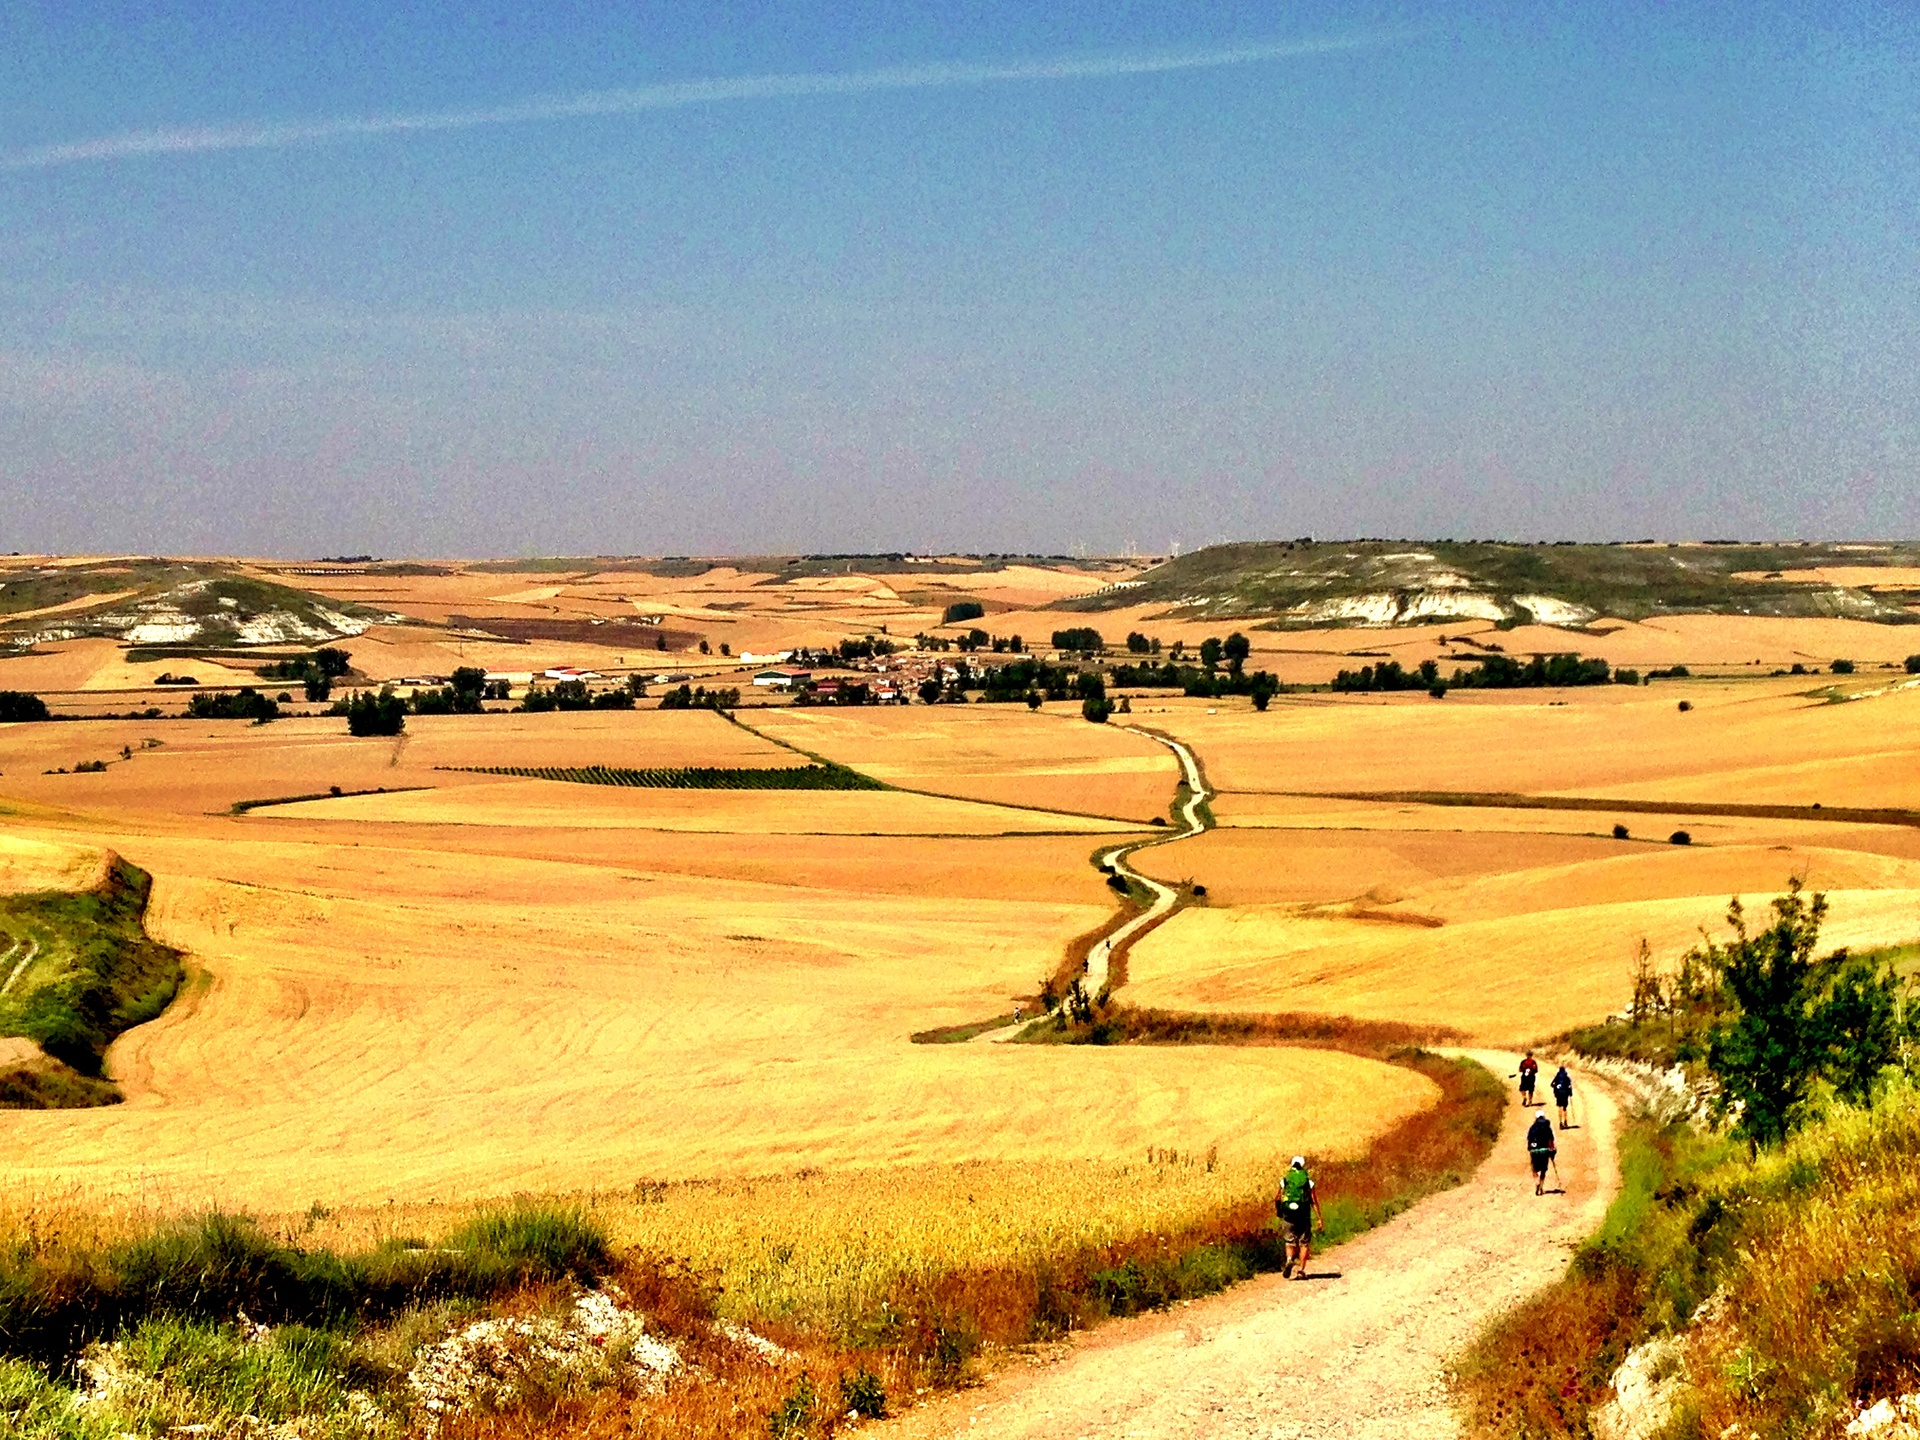 My Favorite Camino Picture